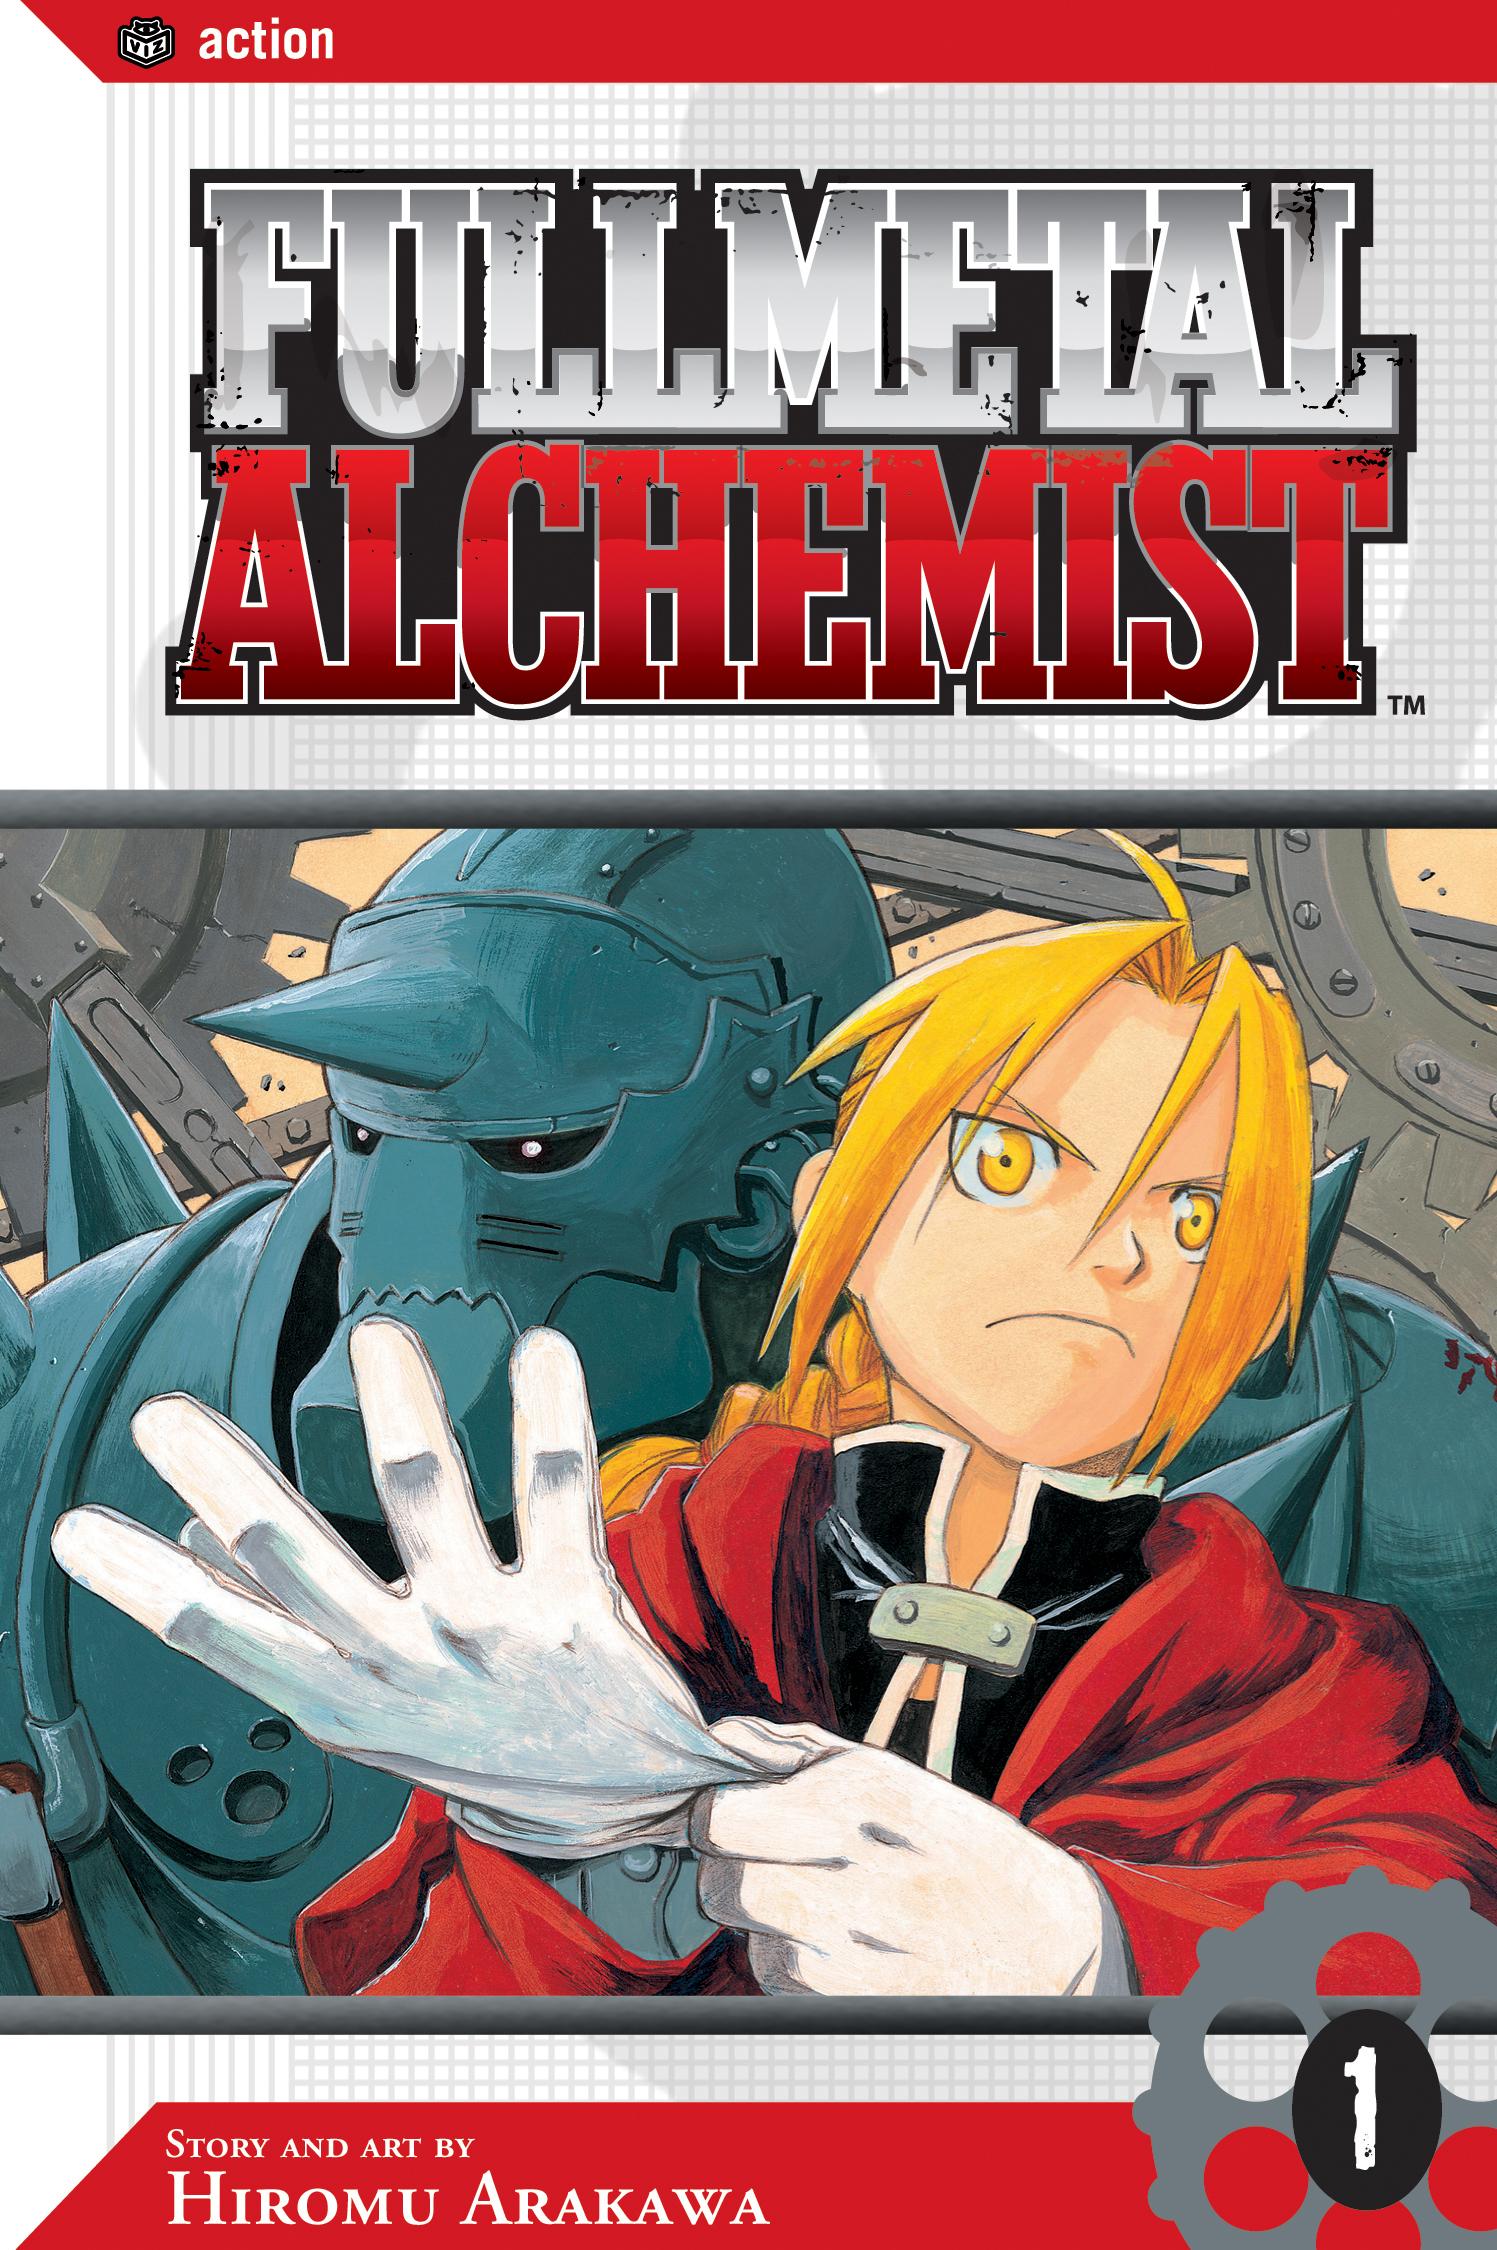 fullmetal alchemist ger sub